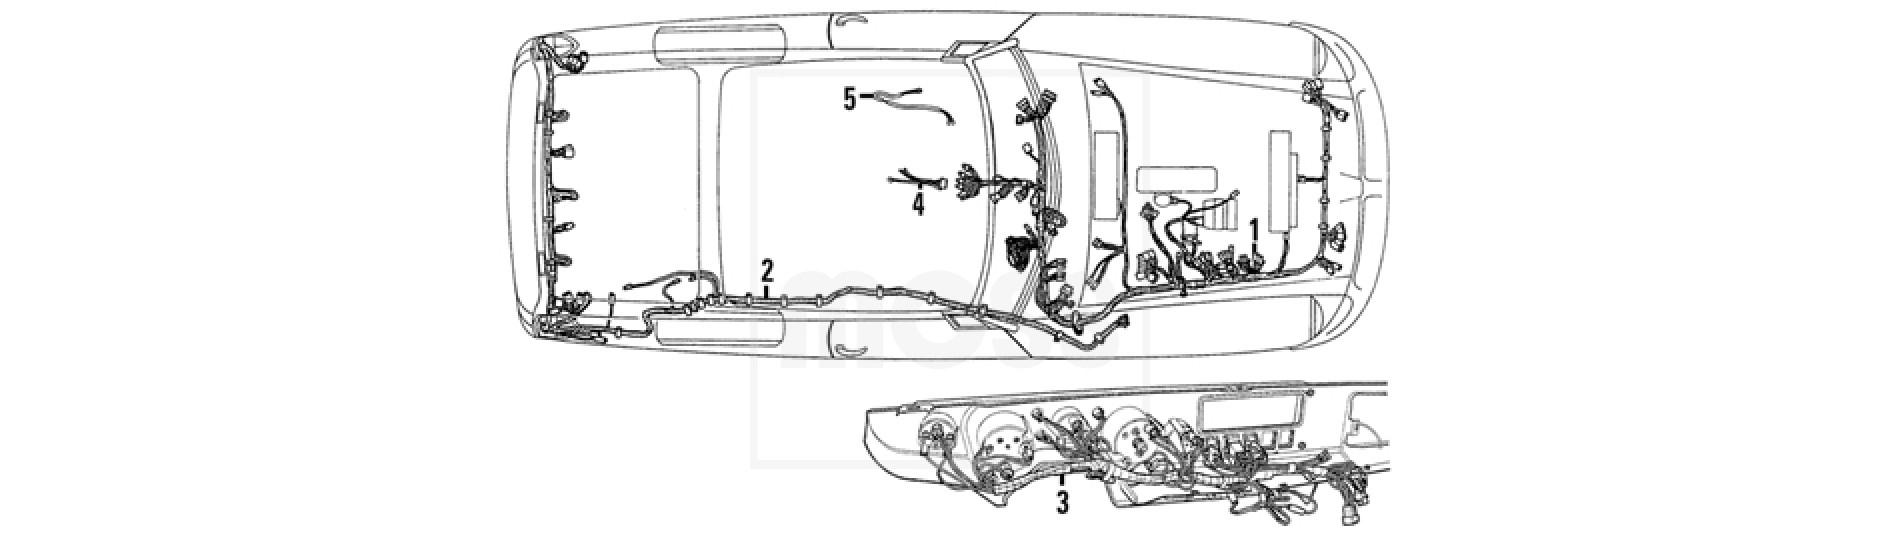 Mgb Wiring Harness - Today Wiring Diagram - Mgb Wiring Diagram